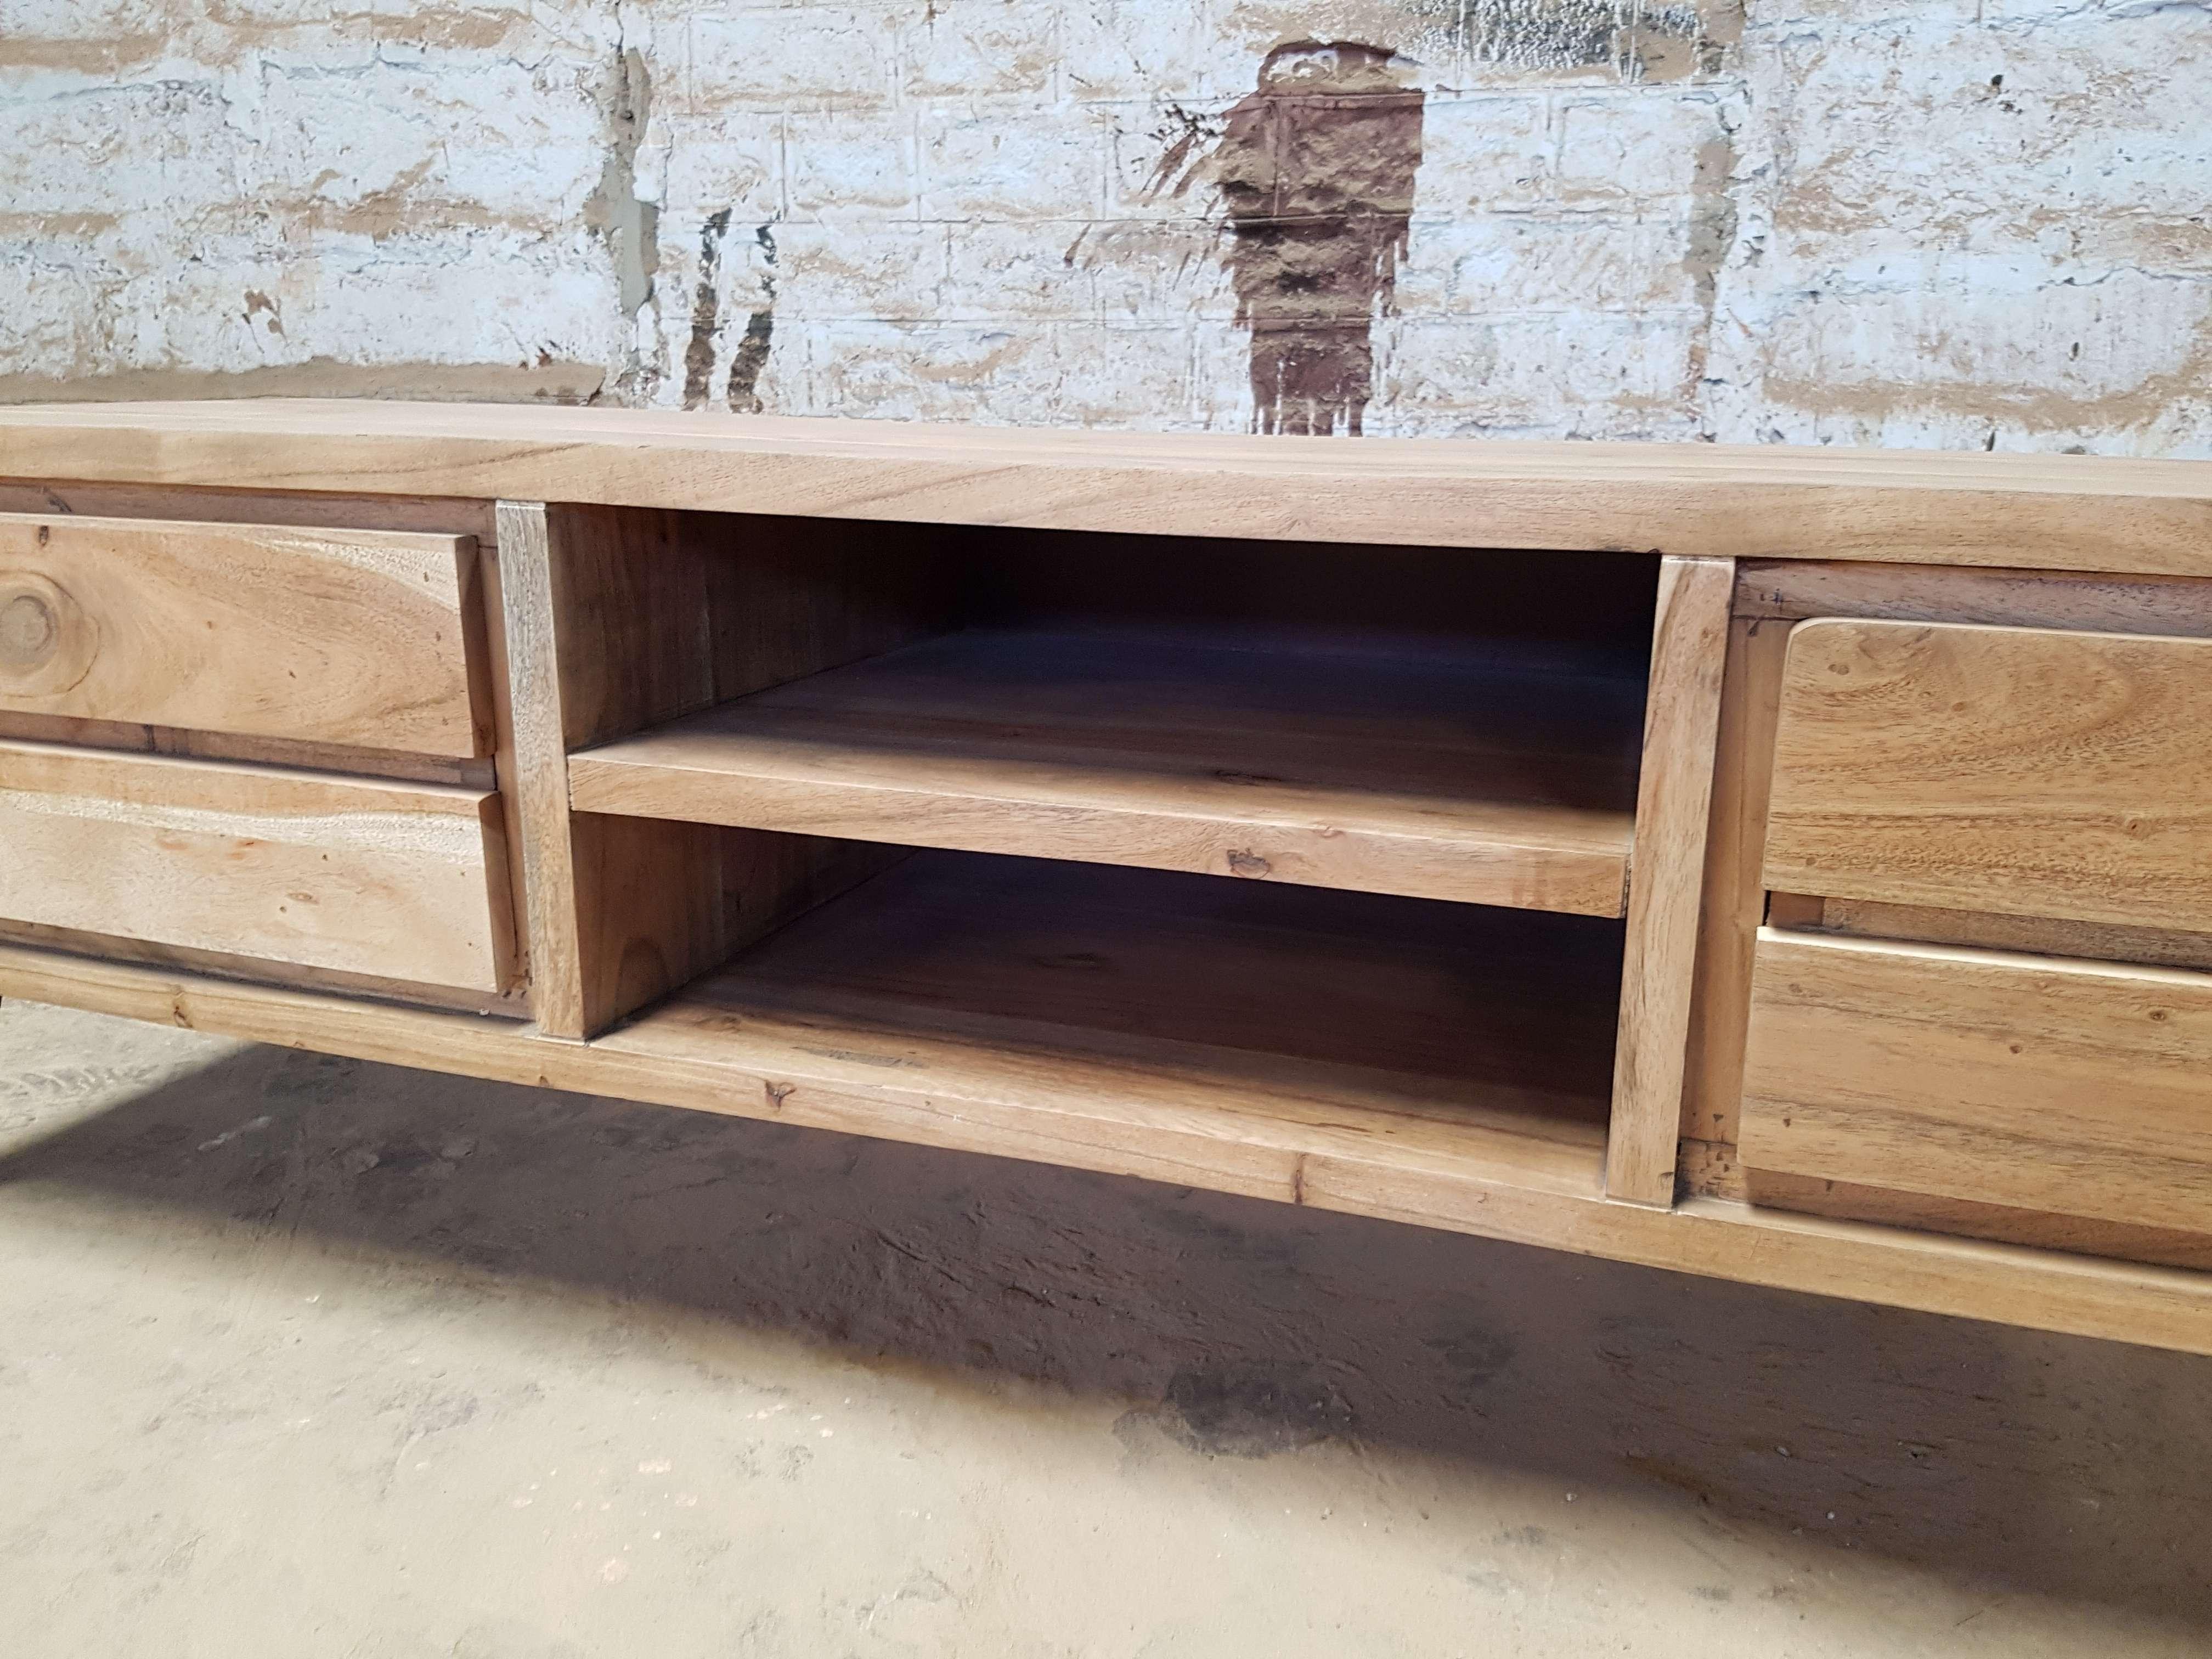 Industrial Furniture – Scandinavian Wooden Tv Cabinet Scandus With Within Scandinavian Tv Stands (View 9 of 15)